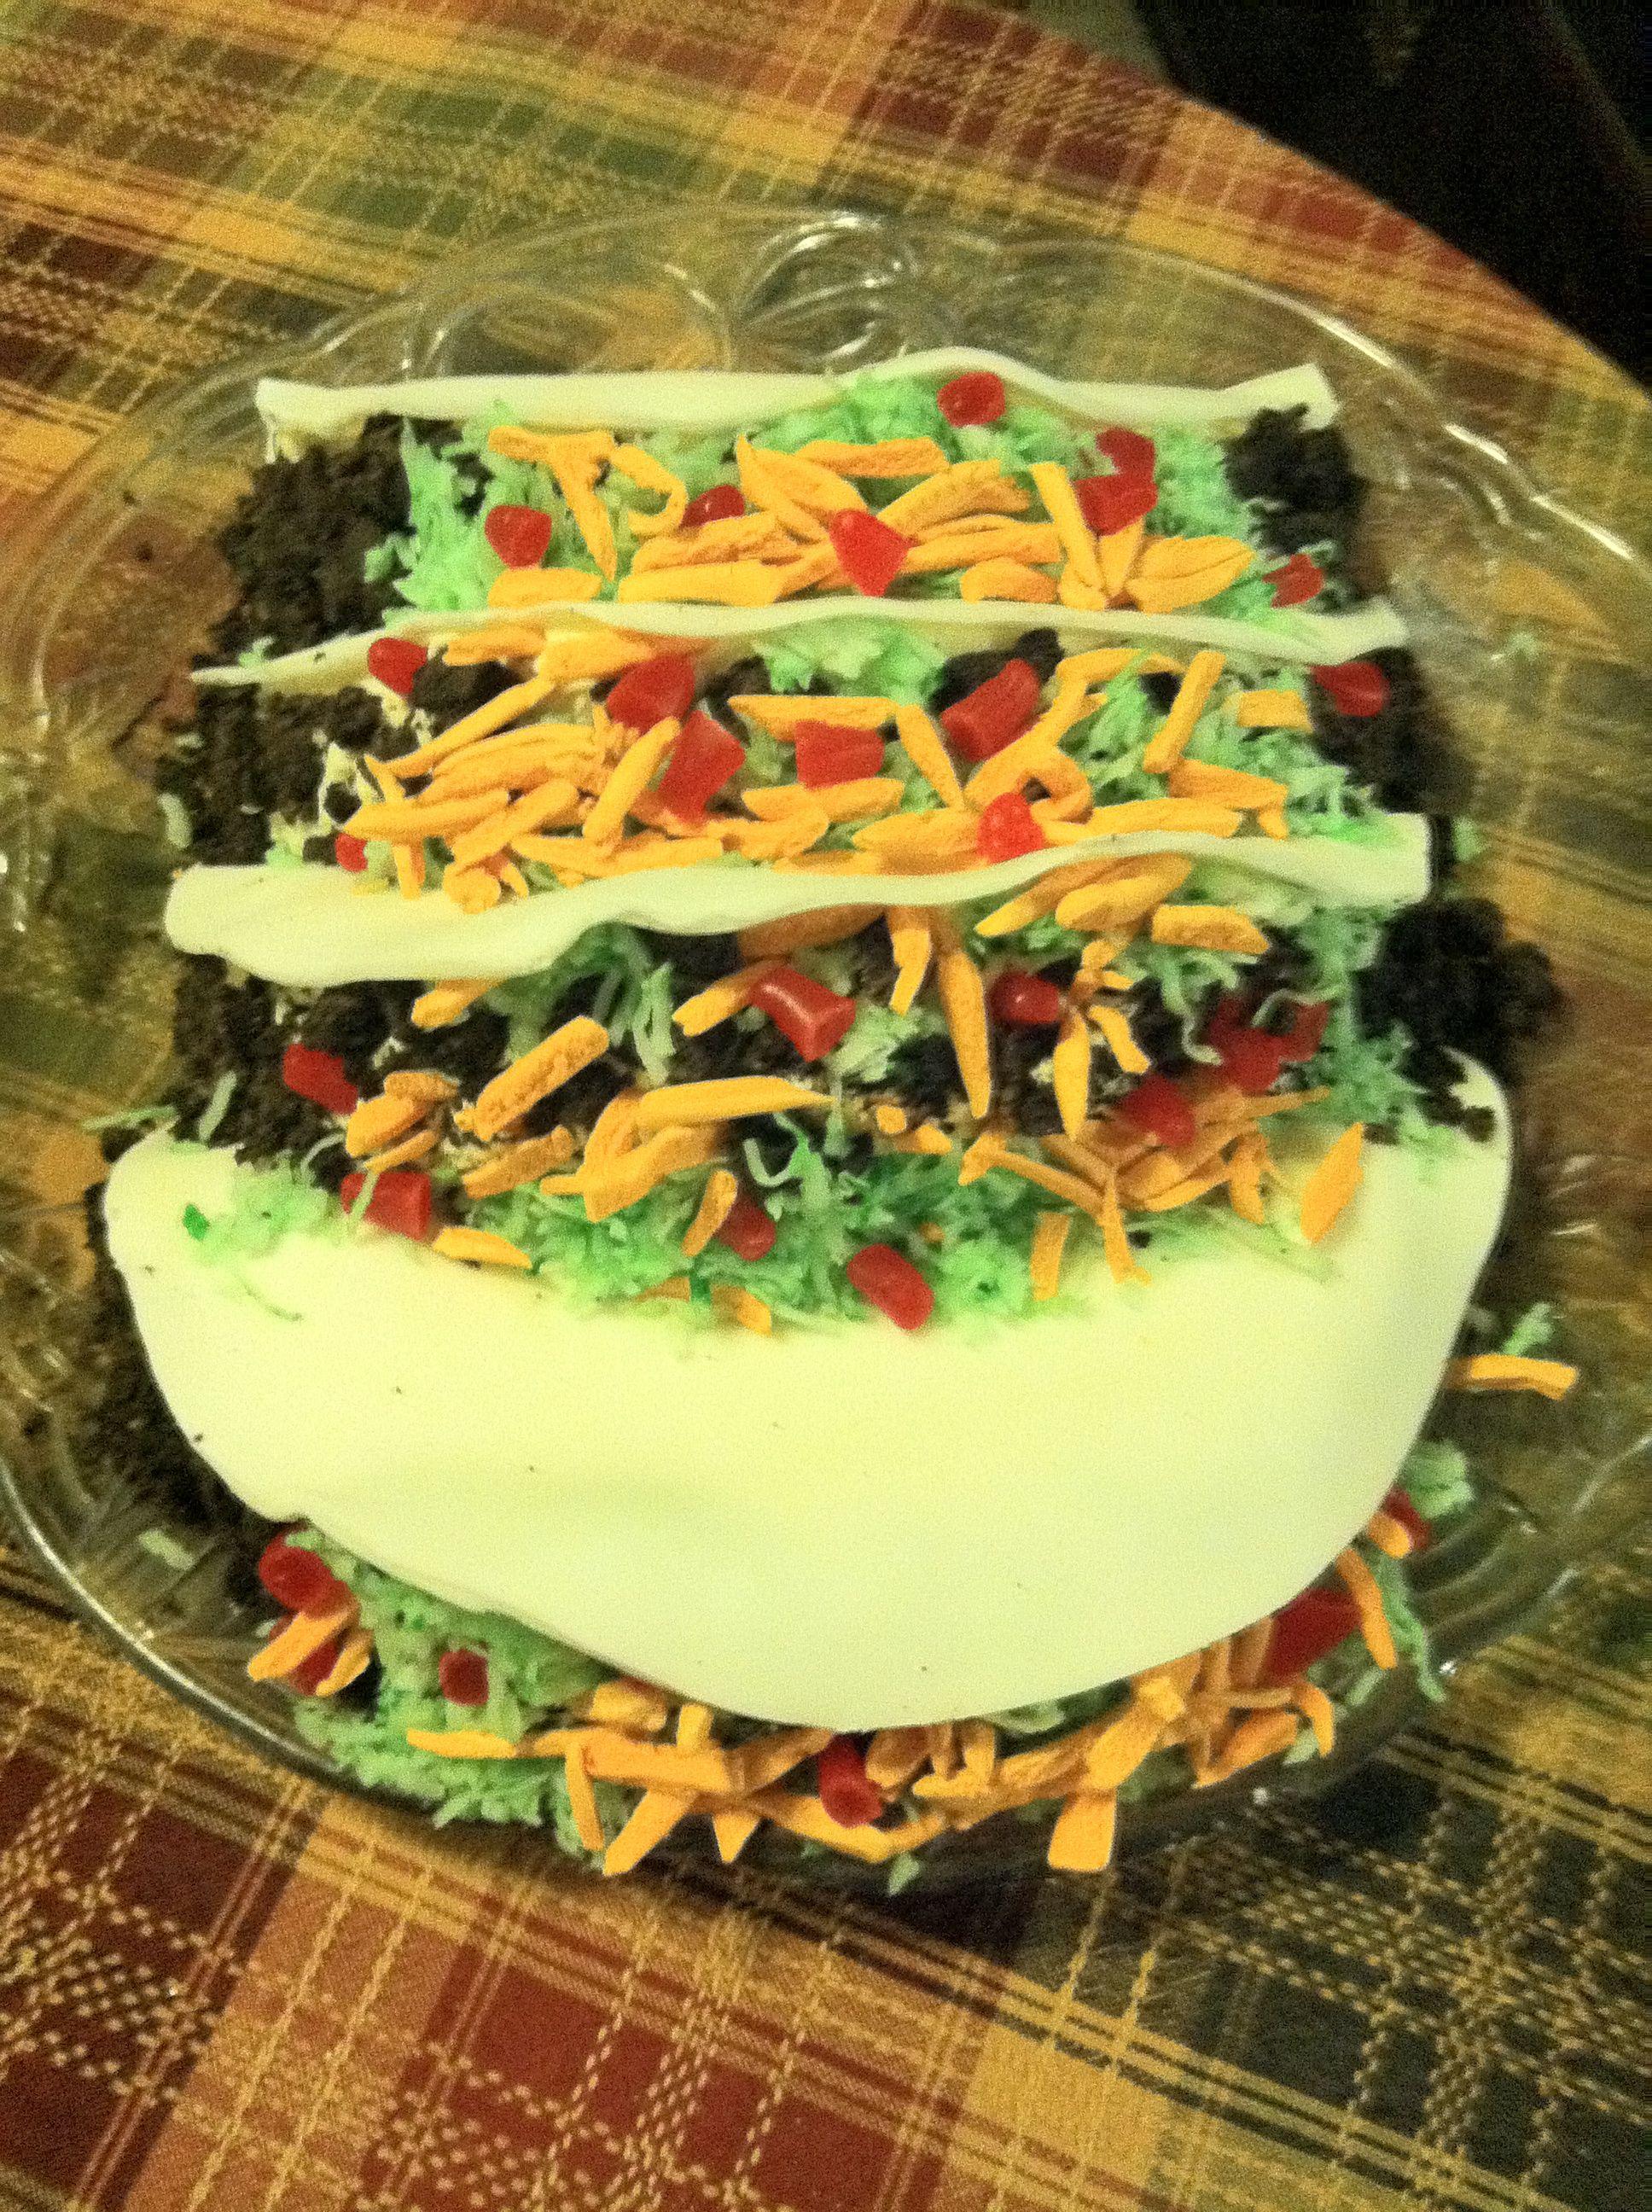 Taco Birthday Cake To Make Pinterest Cake Birthday Cake And